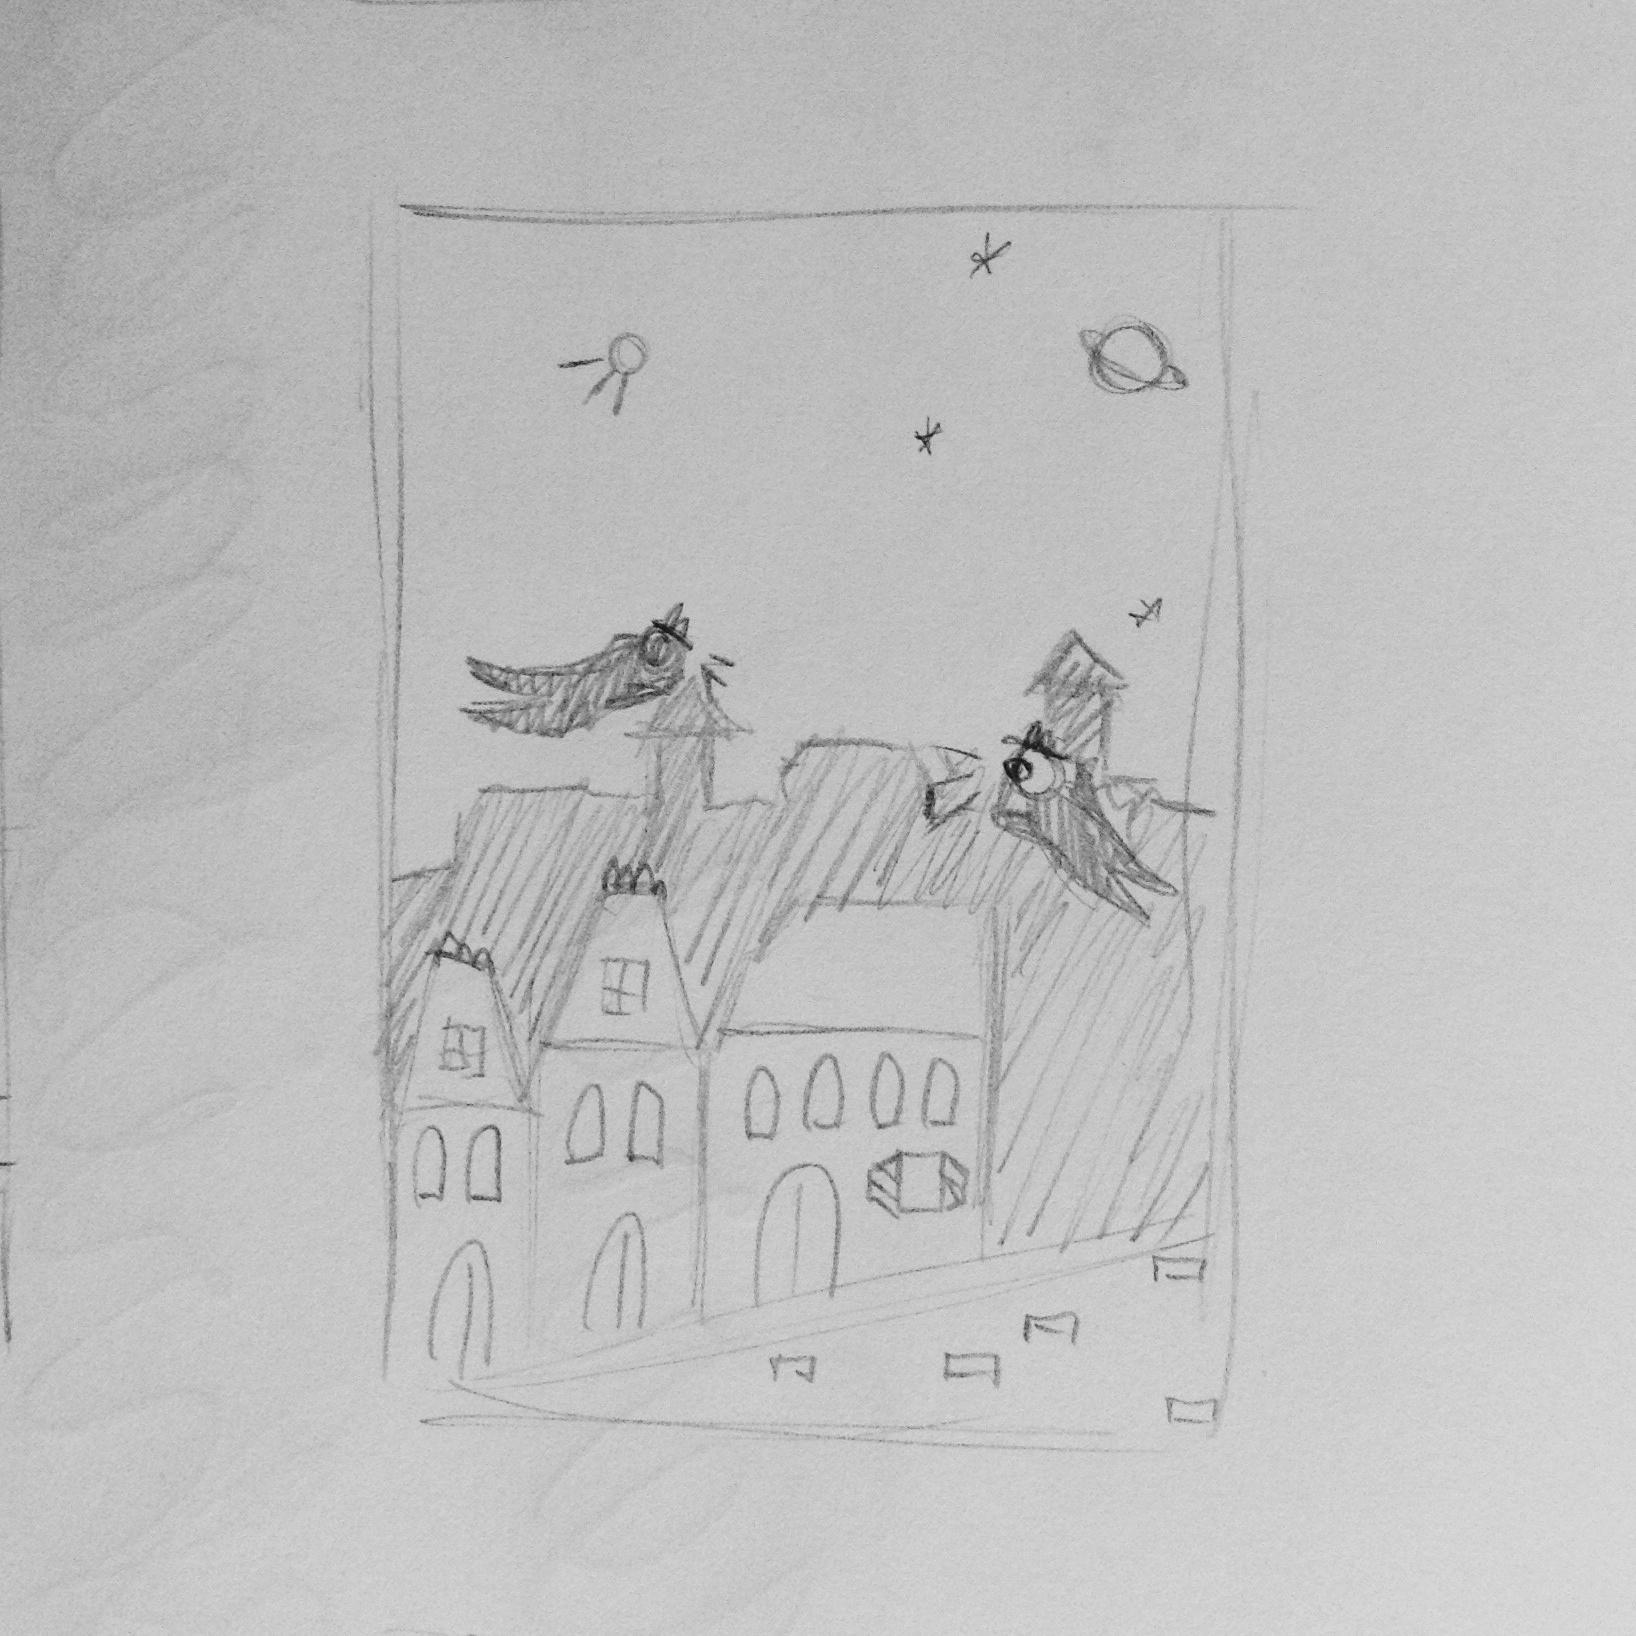 Nuremberg - image 5 - student project